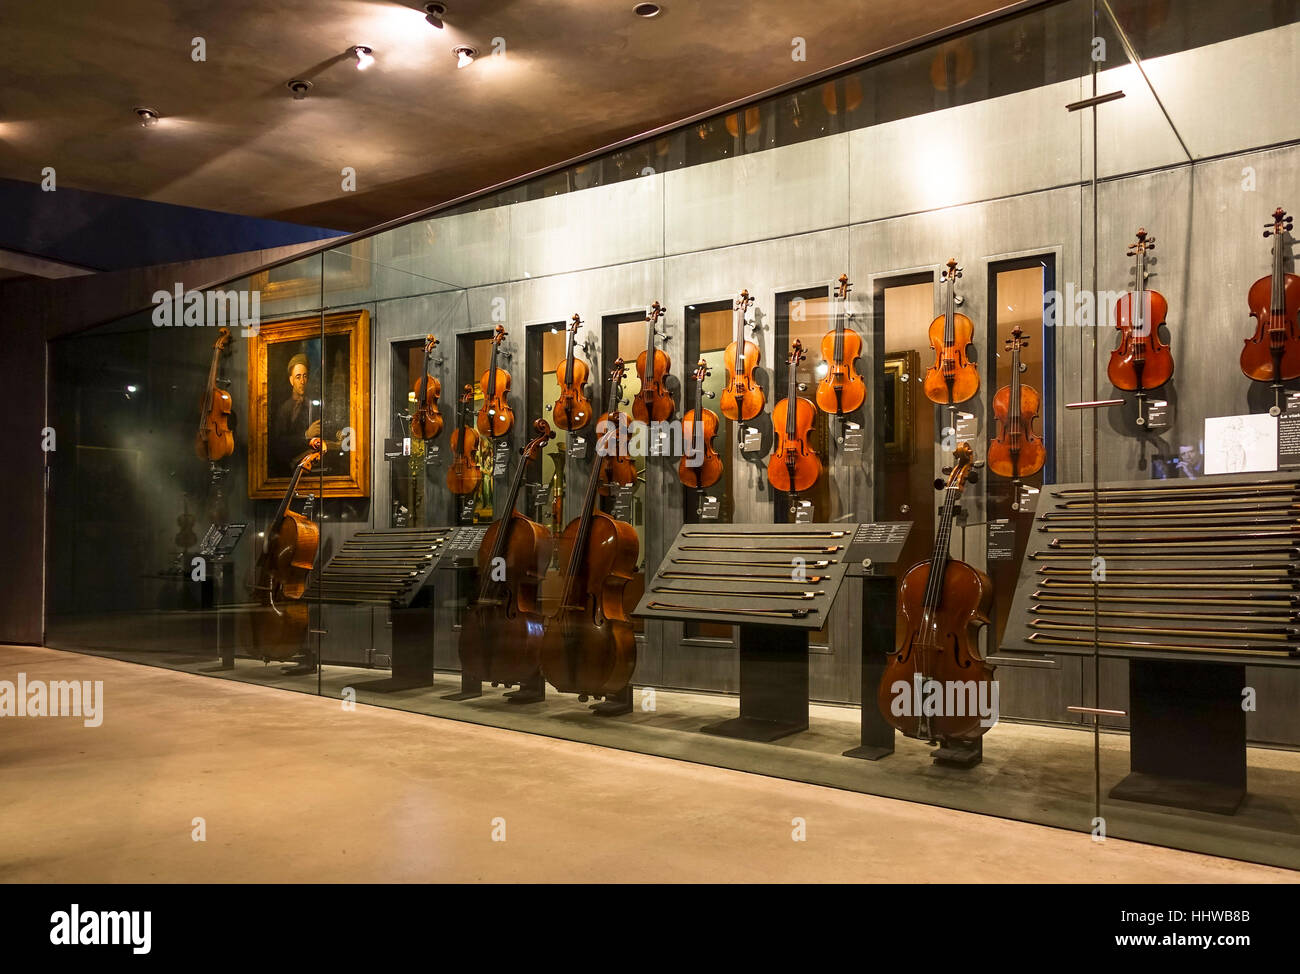 Old violins on display in Interior musée de la cite, museum, Cite de la musique, Paris, France. - Stock Image